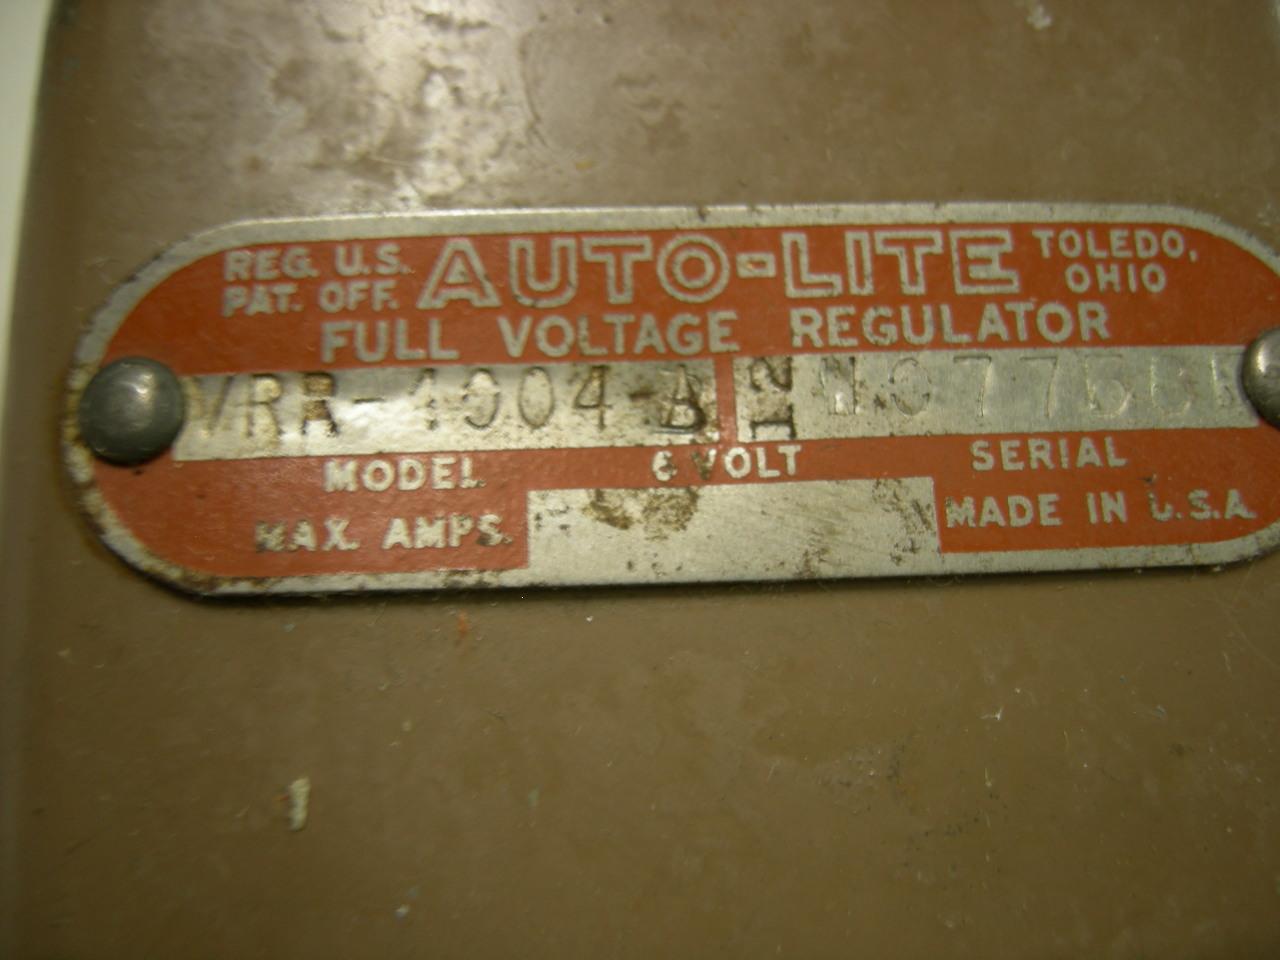 1940 – 42 Willys voltage regulator autolite NOS VRR4004A (a VRR4004a)